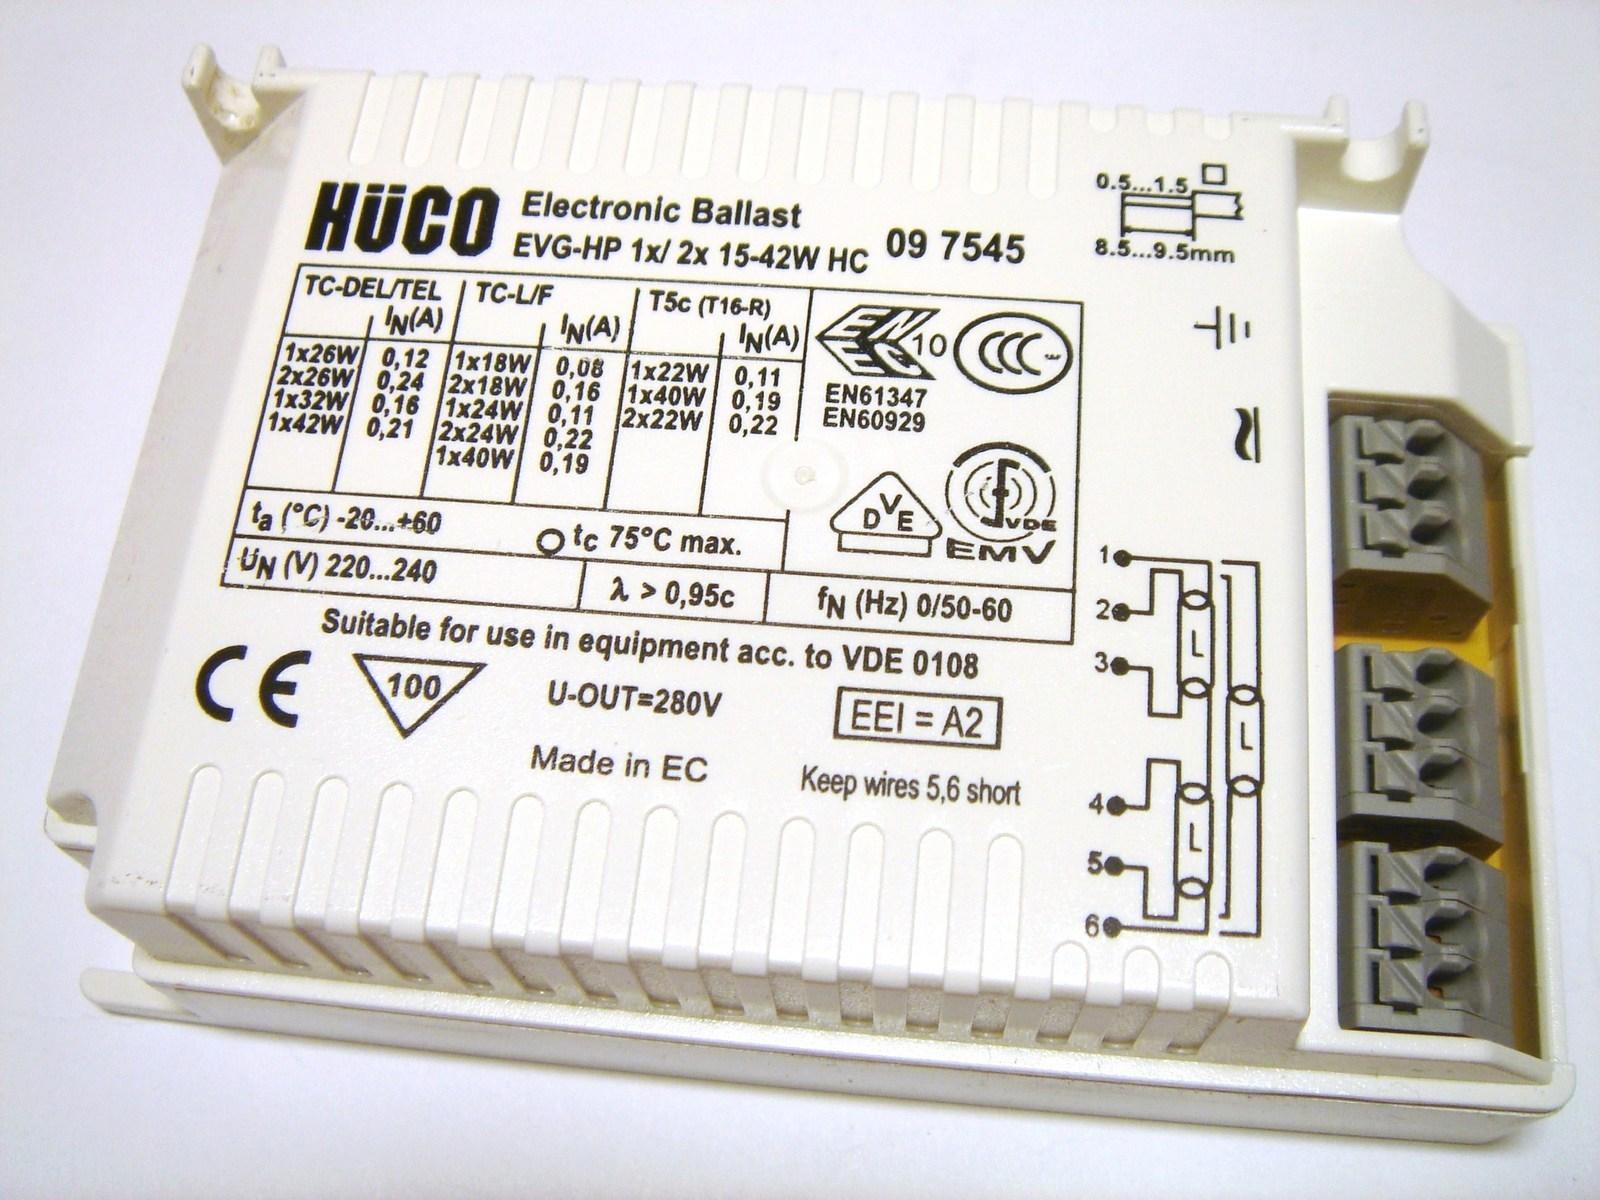 Elektrooniline drossel 1x18-42 W või 2x18-26 W, Hüco, EVG-HP 1x/ 2x 15-42W HC